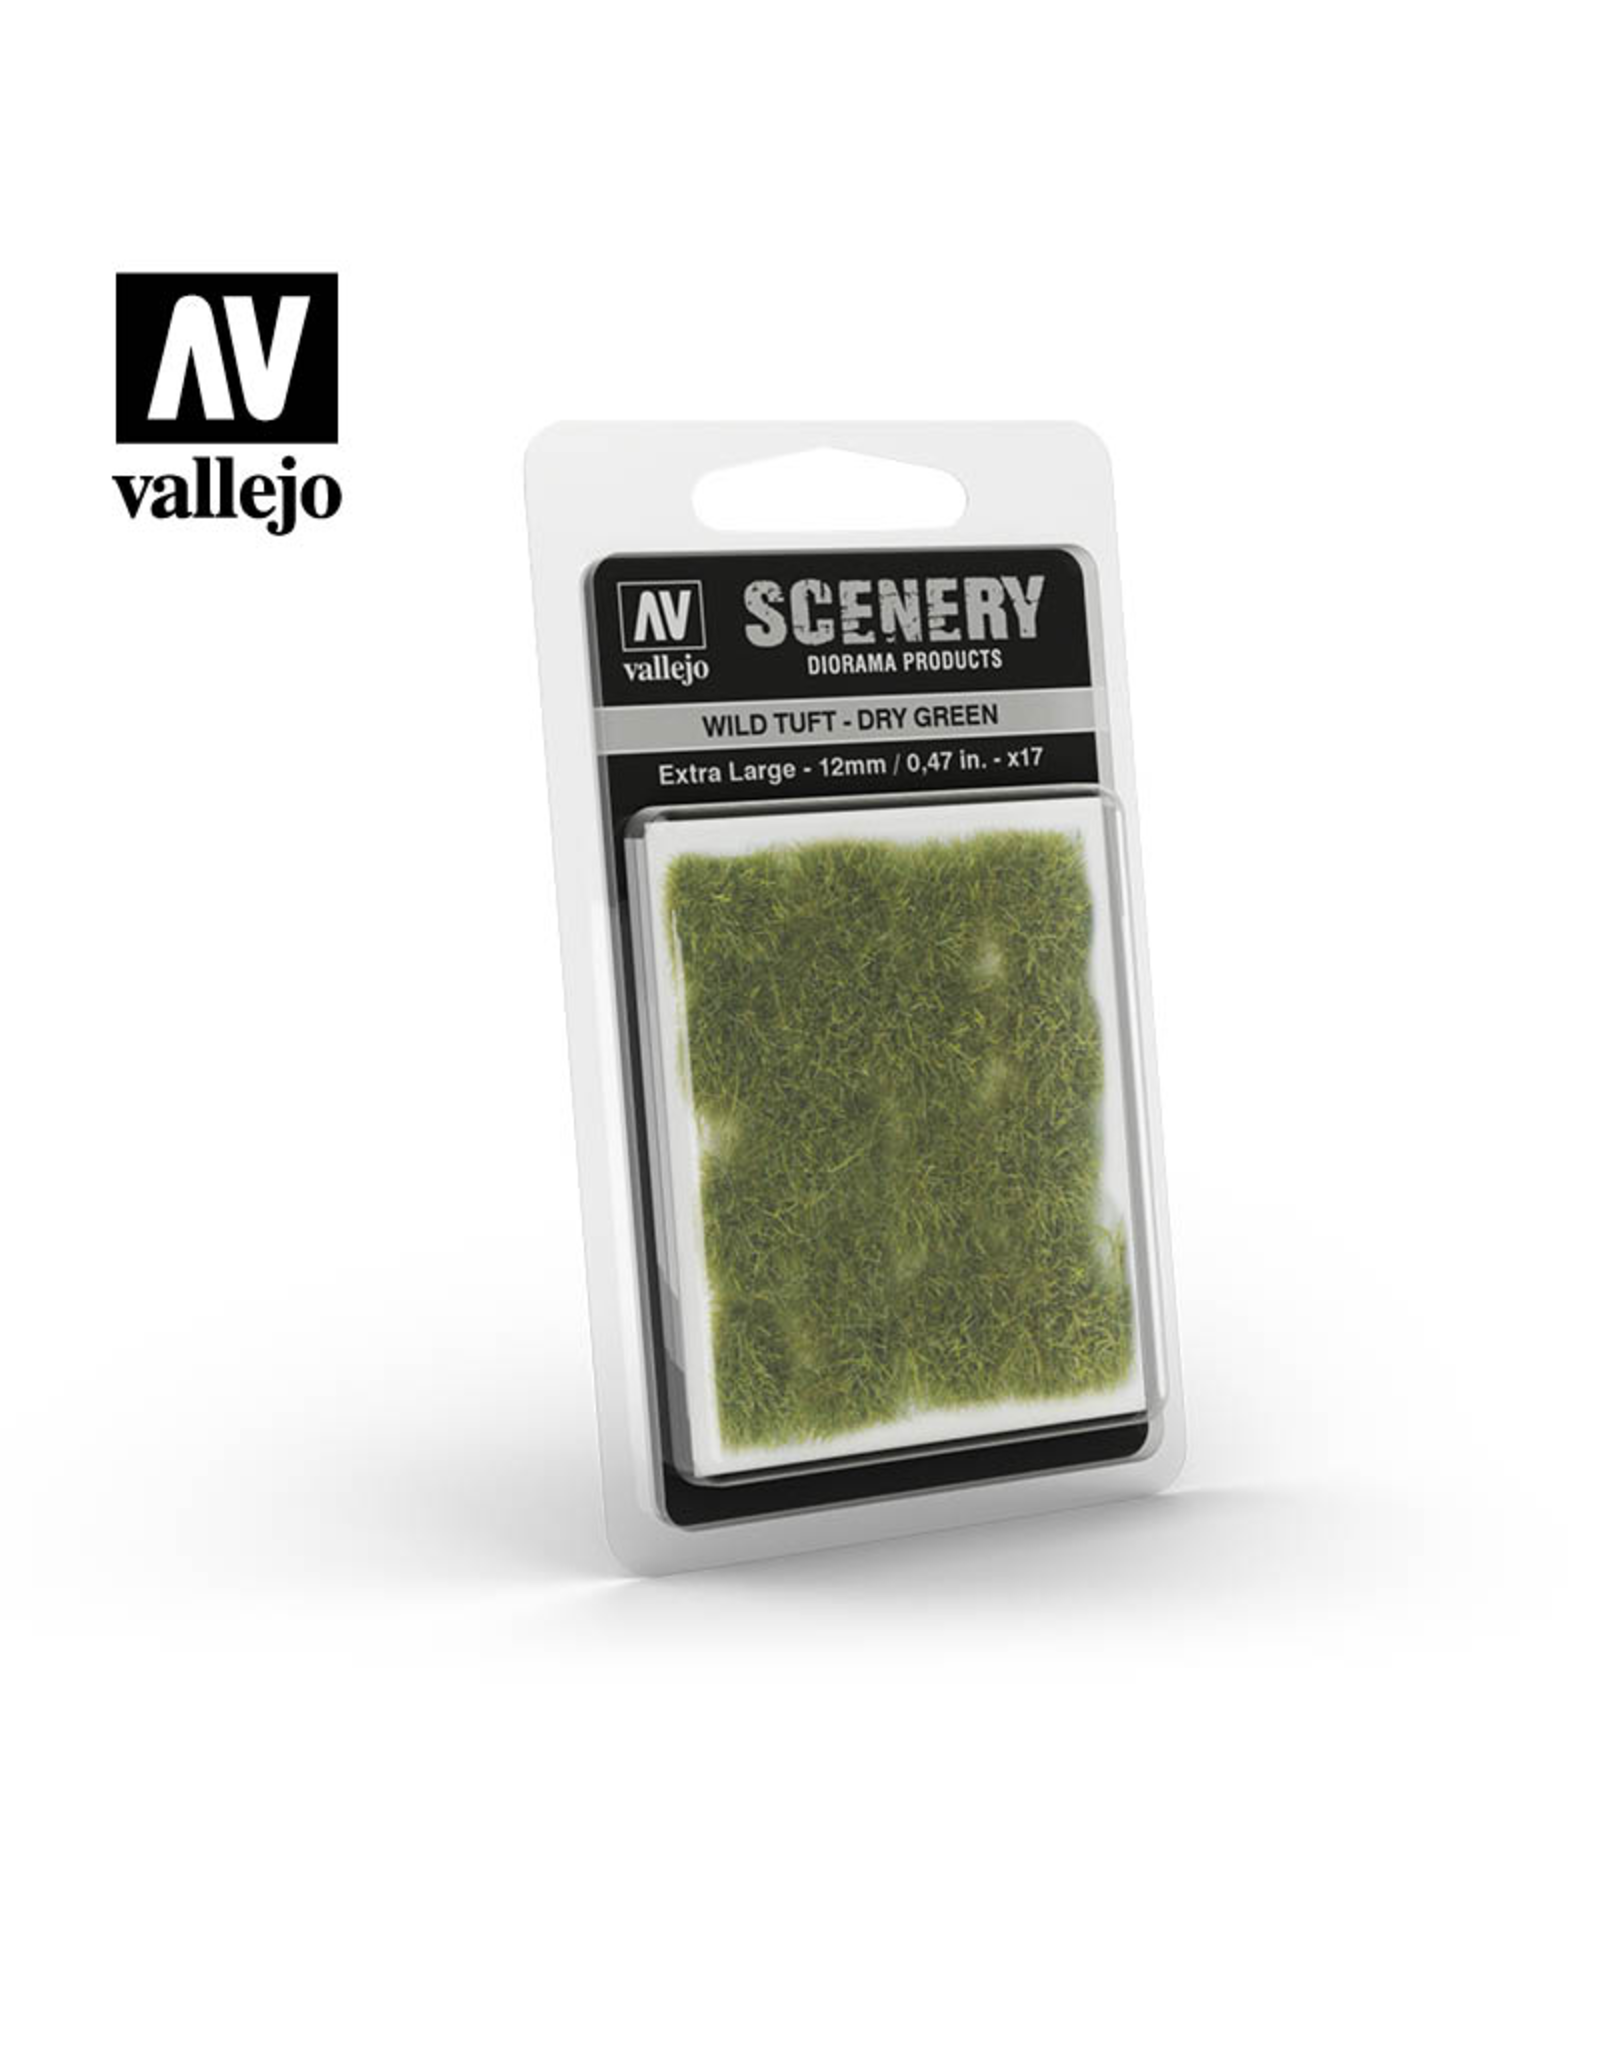 Vallejo Wild tuft - Dry Green (12mm)